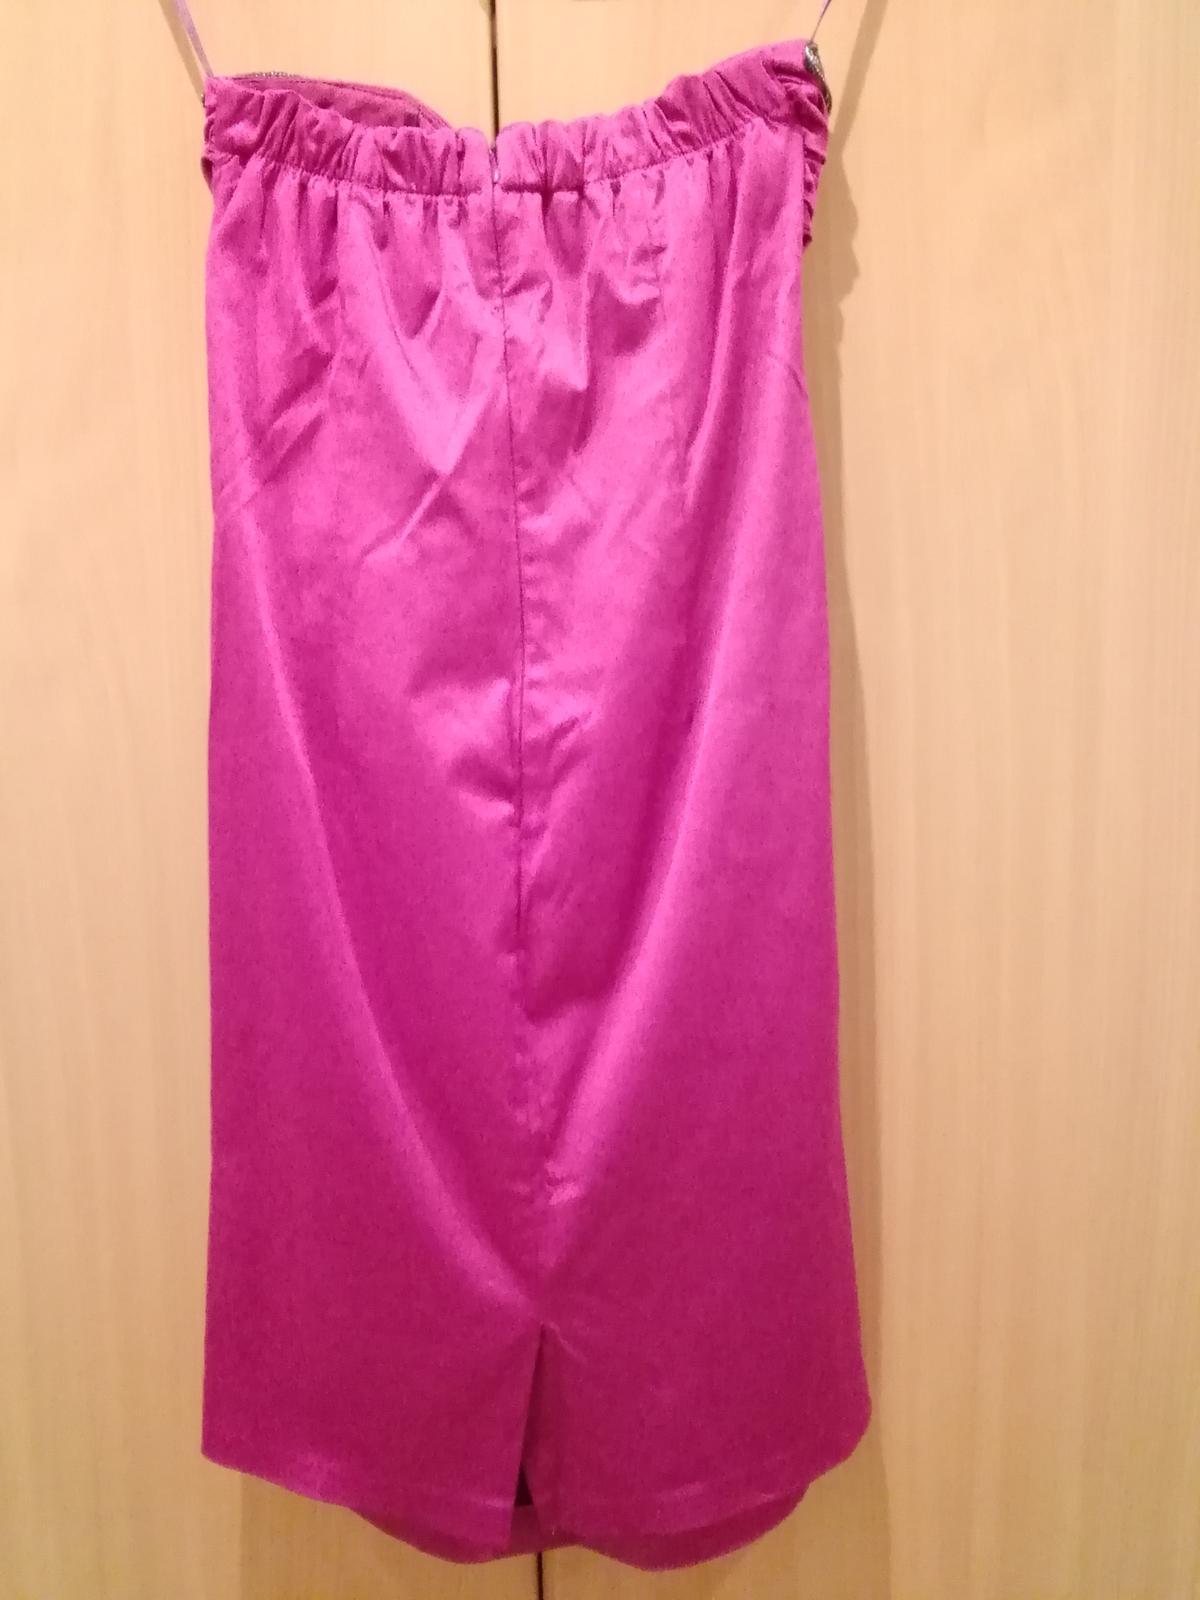 Saténové cyklaménové šaty - Obrázok č. 2